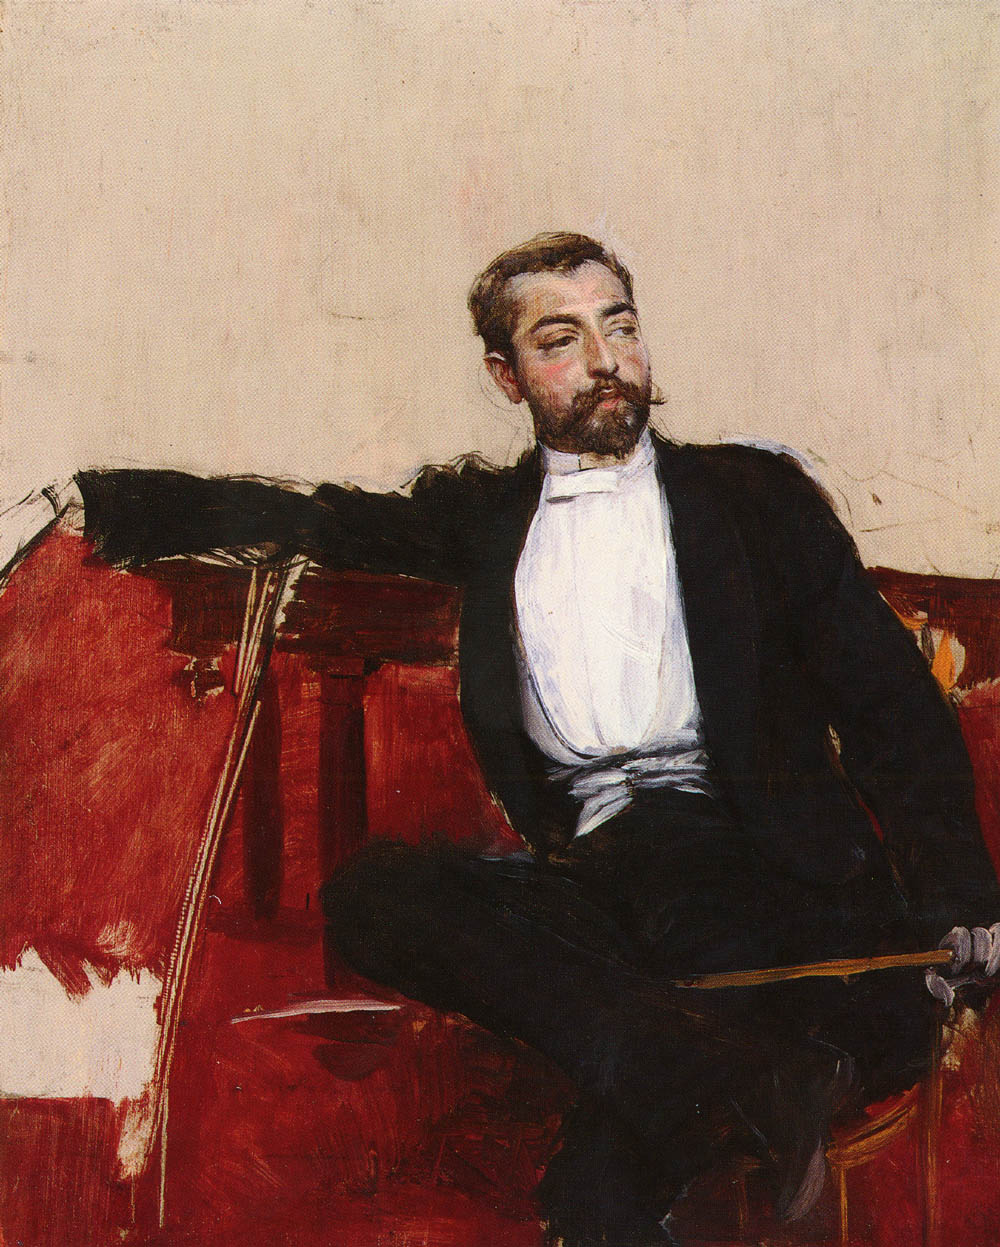 Giovanni boldini 1842 1931 a portrait of john singer sargent